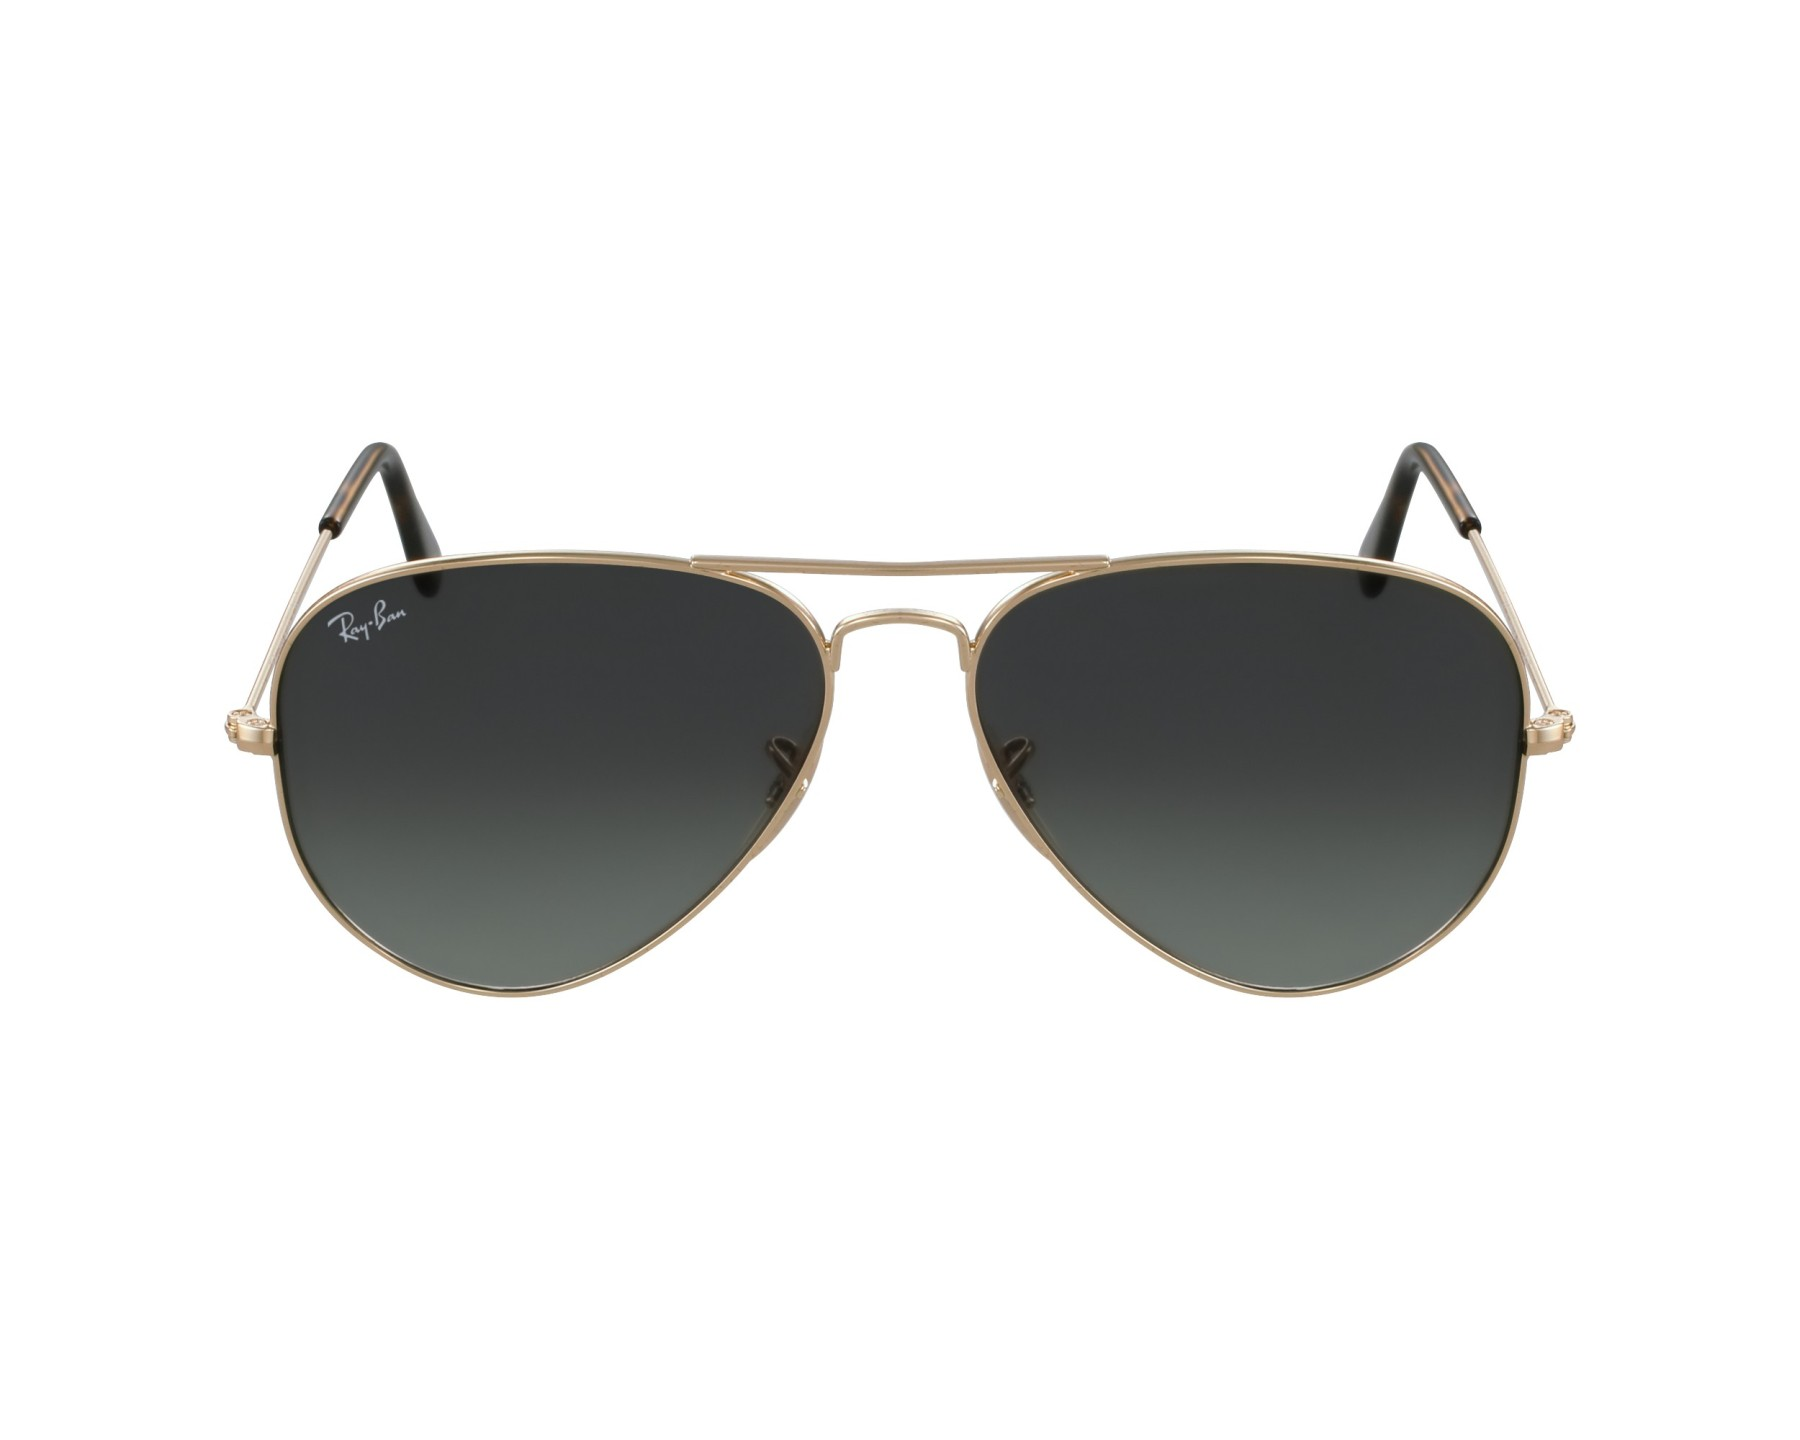 ray ban sonnenbrille aviator gradient rb 3025 181 71. Black Bedroom Furniture Sets. Home Design Ideas